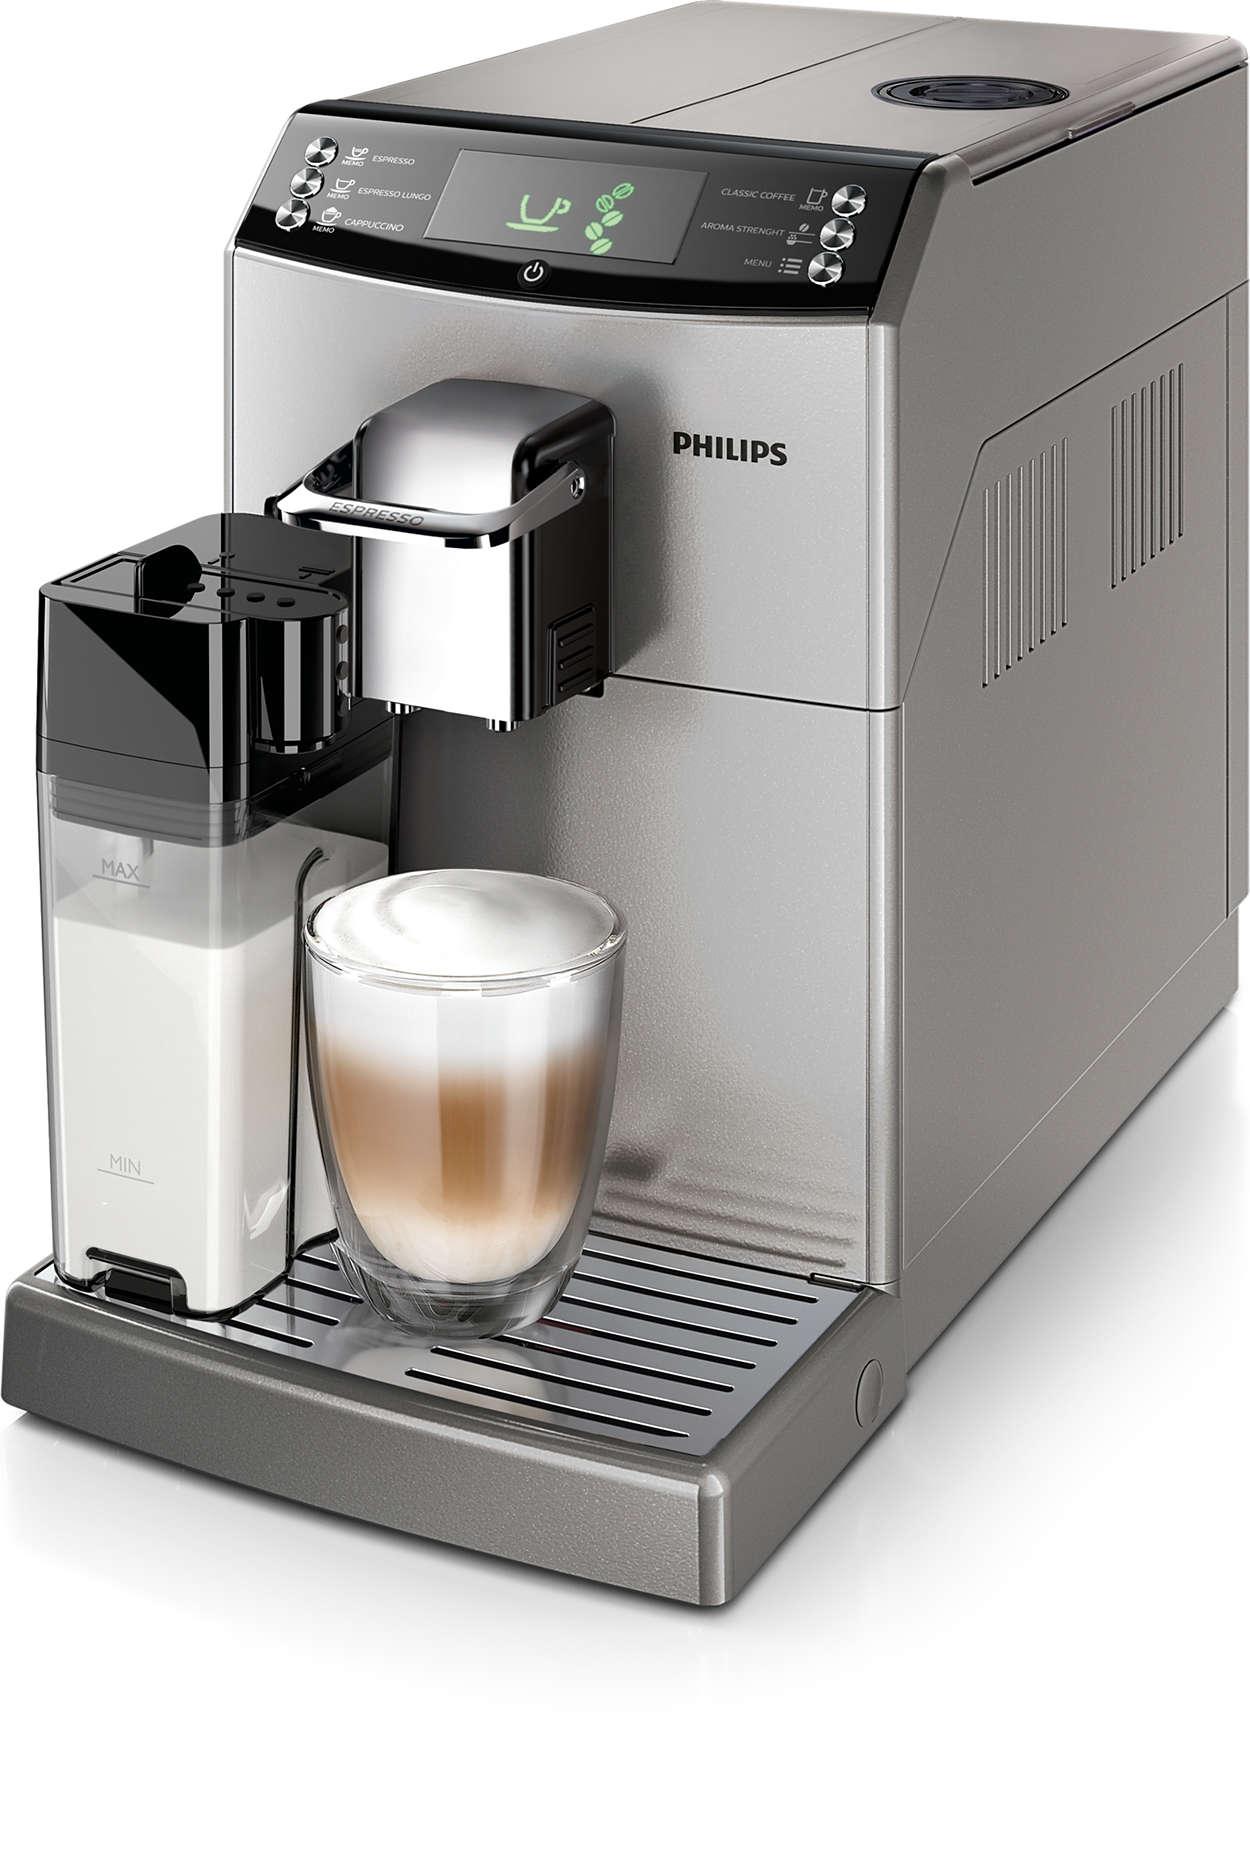 4000 series machine espresso super automatique hd8847 11 philips. Black Bedroom Furniture Sets. Home Design Ideas